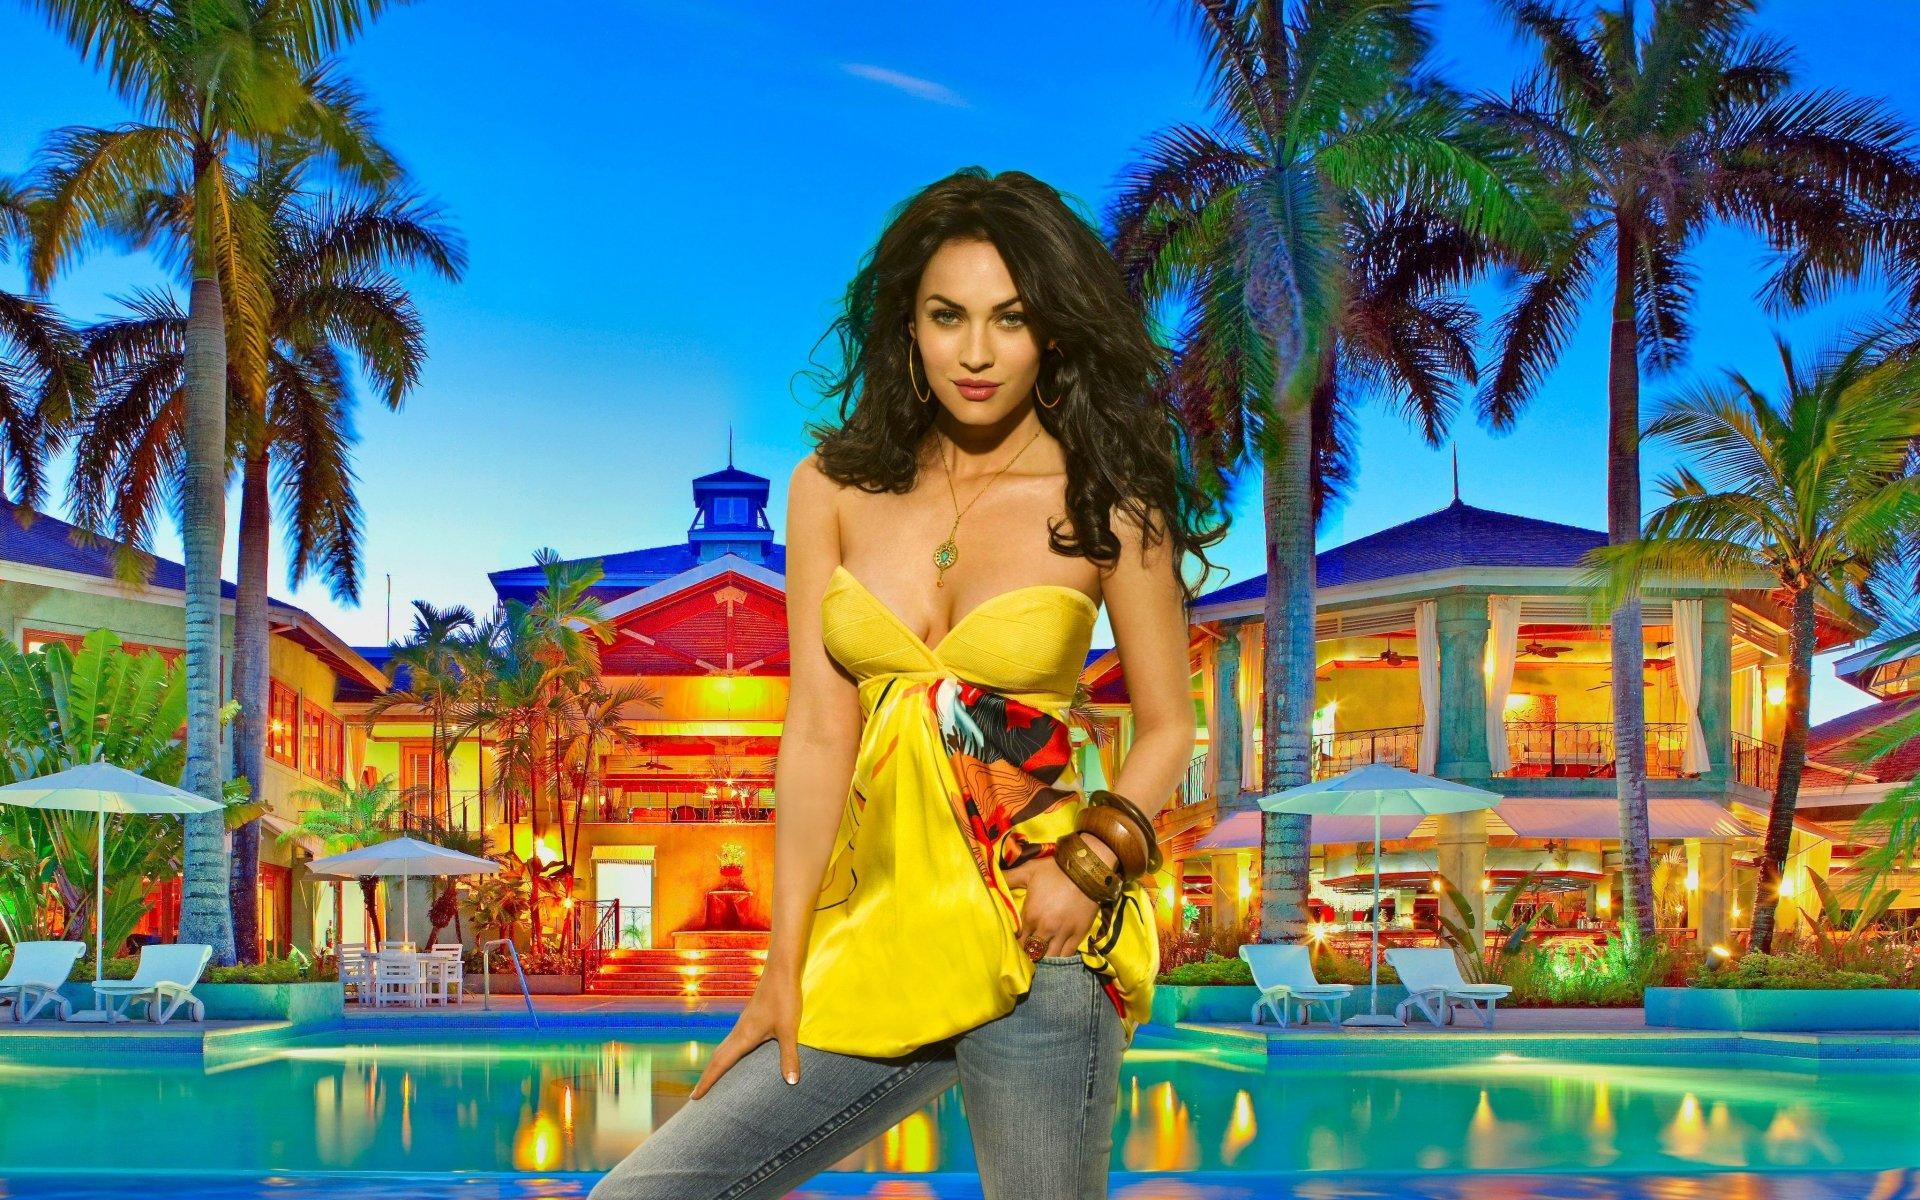 Celebrita' - Megan Fox  Turchese Riflessi Colorful Palma Tropicale Modelle Sfondo